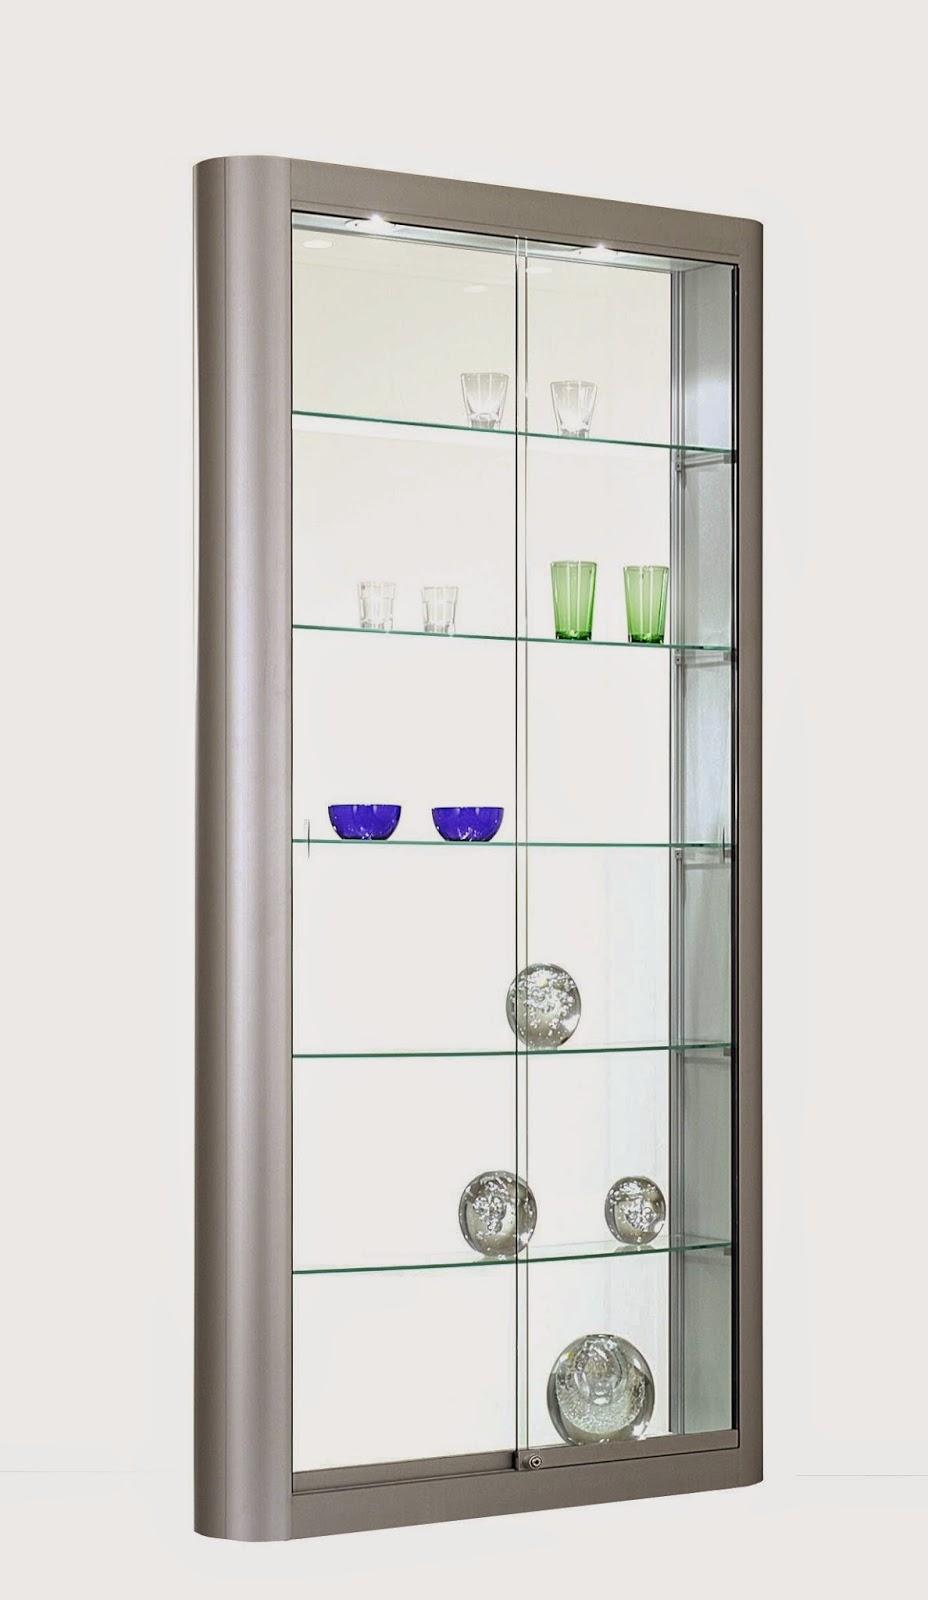 Vitrinekast Glas Hangend.Vitrine Masters 2014